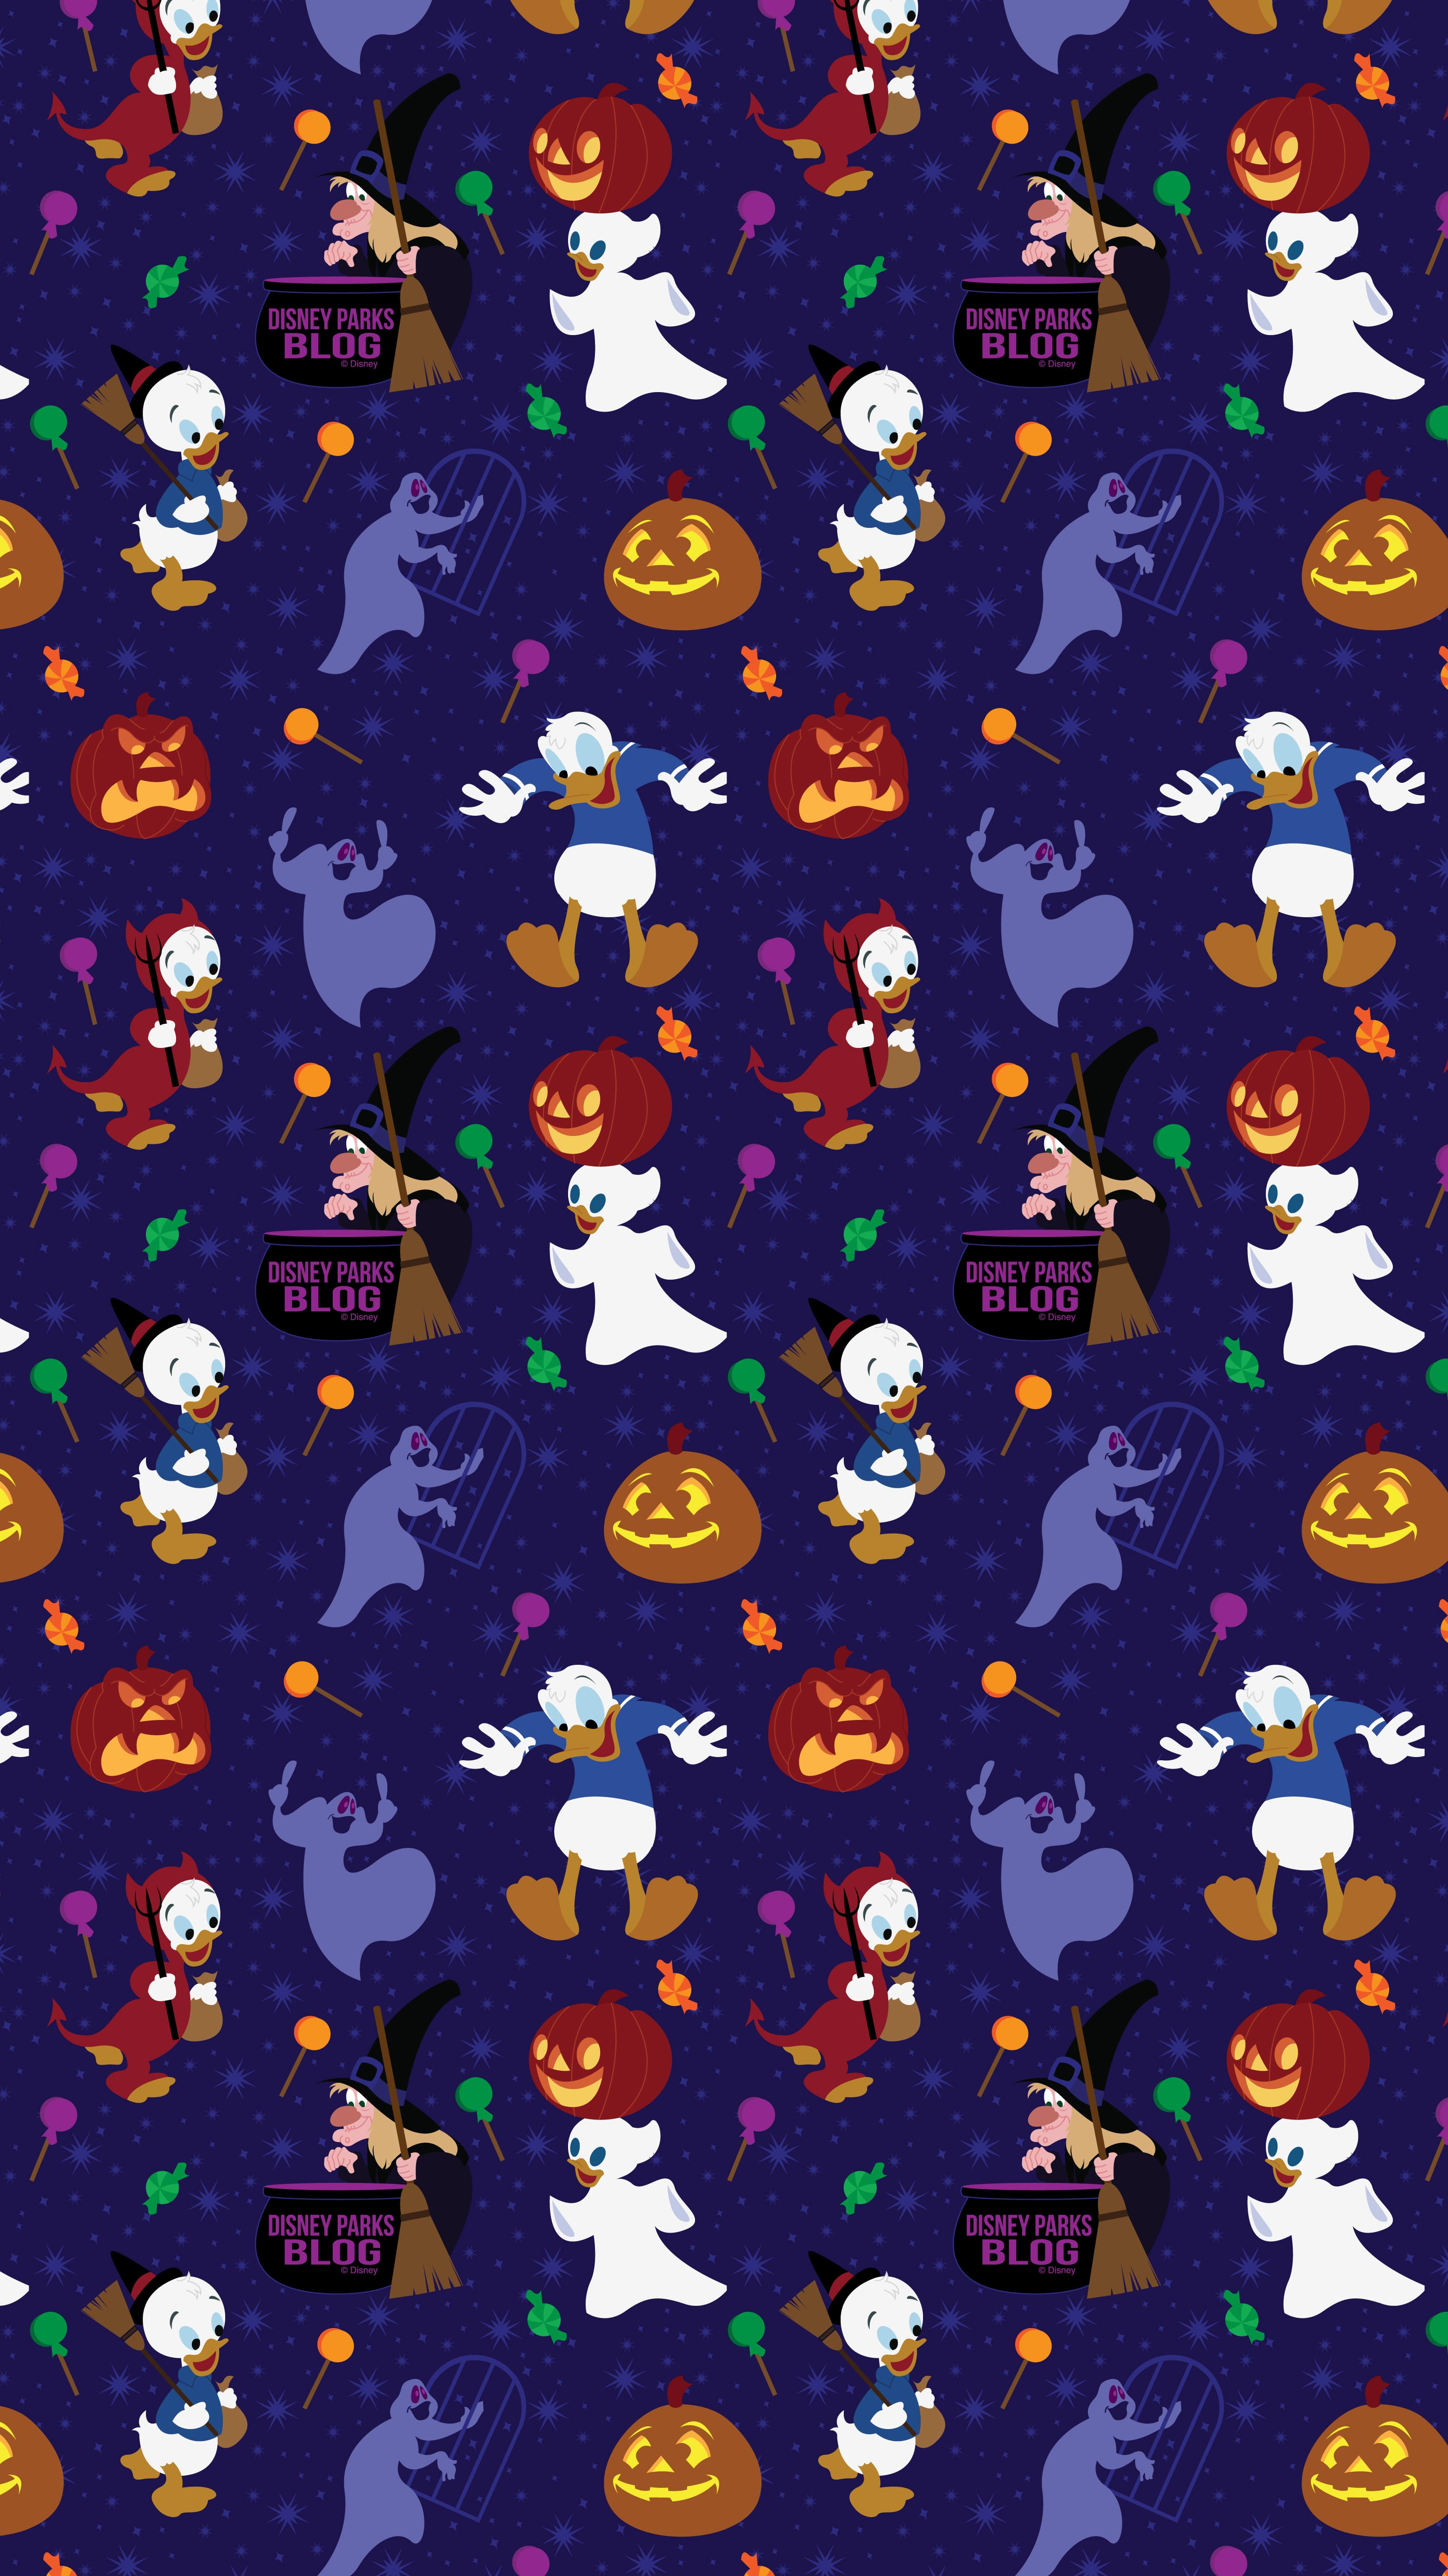 2019 Donald Duck Halloween Wallpaper Iphone Android Disney Parks Blog